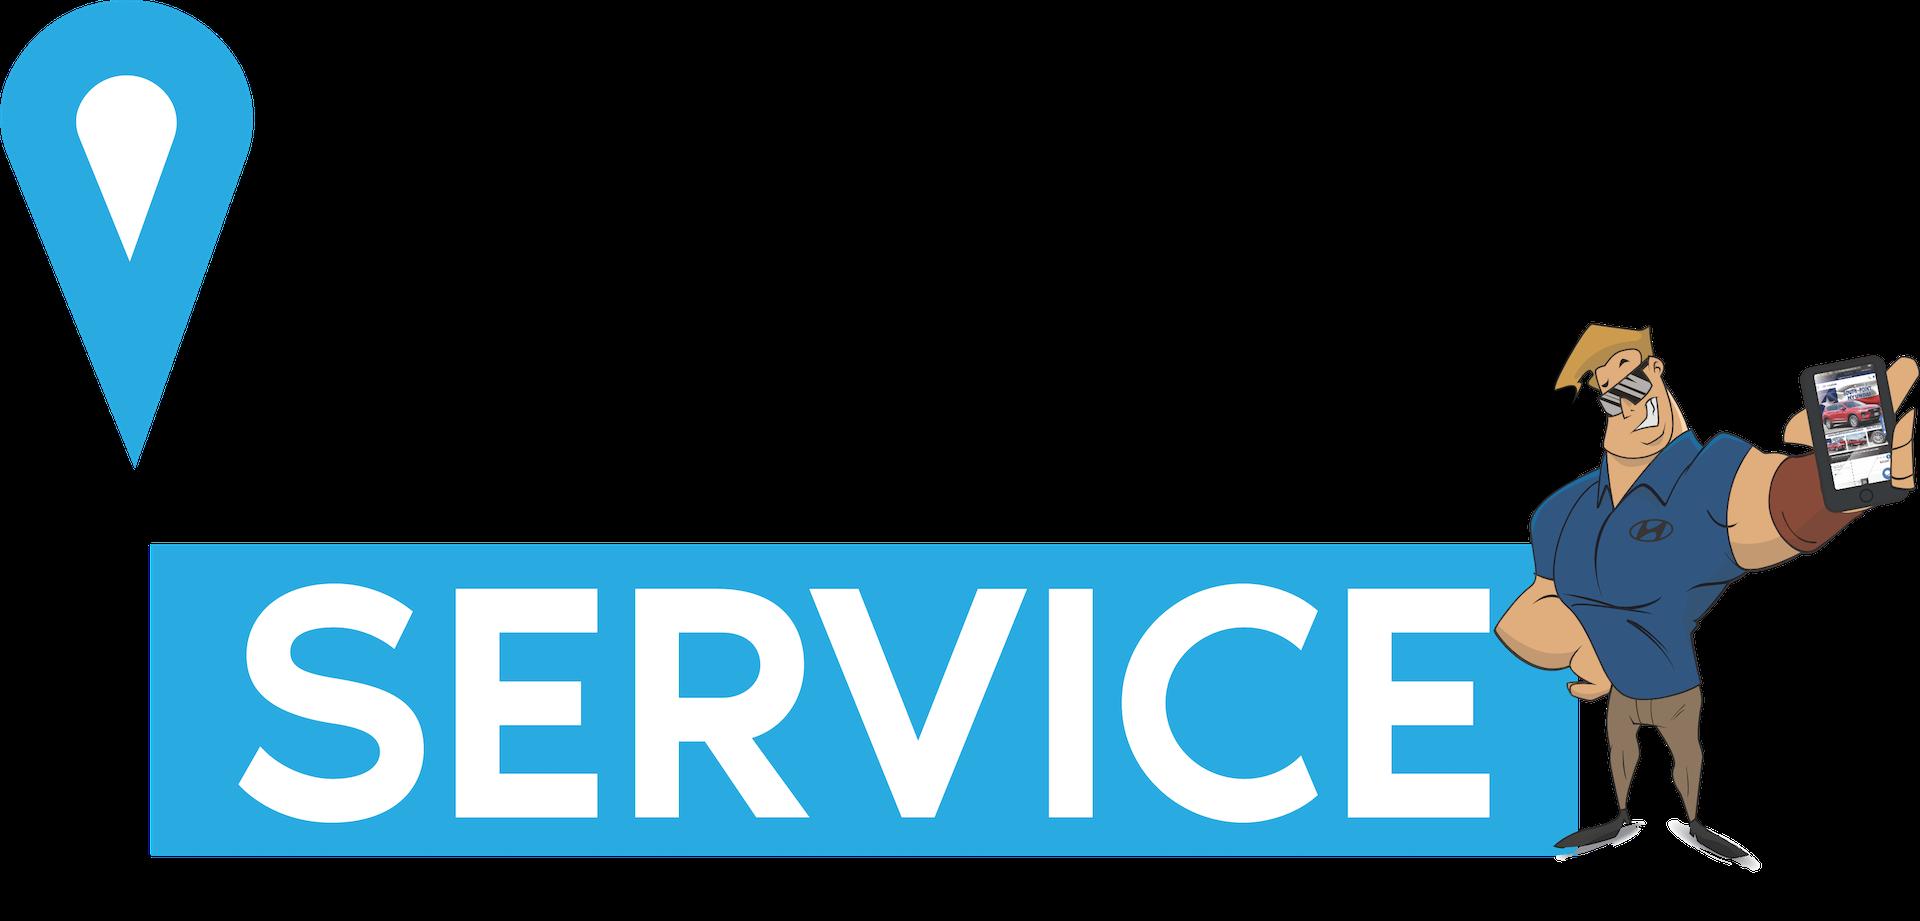 Valet Service banner